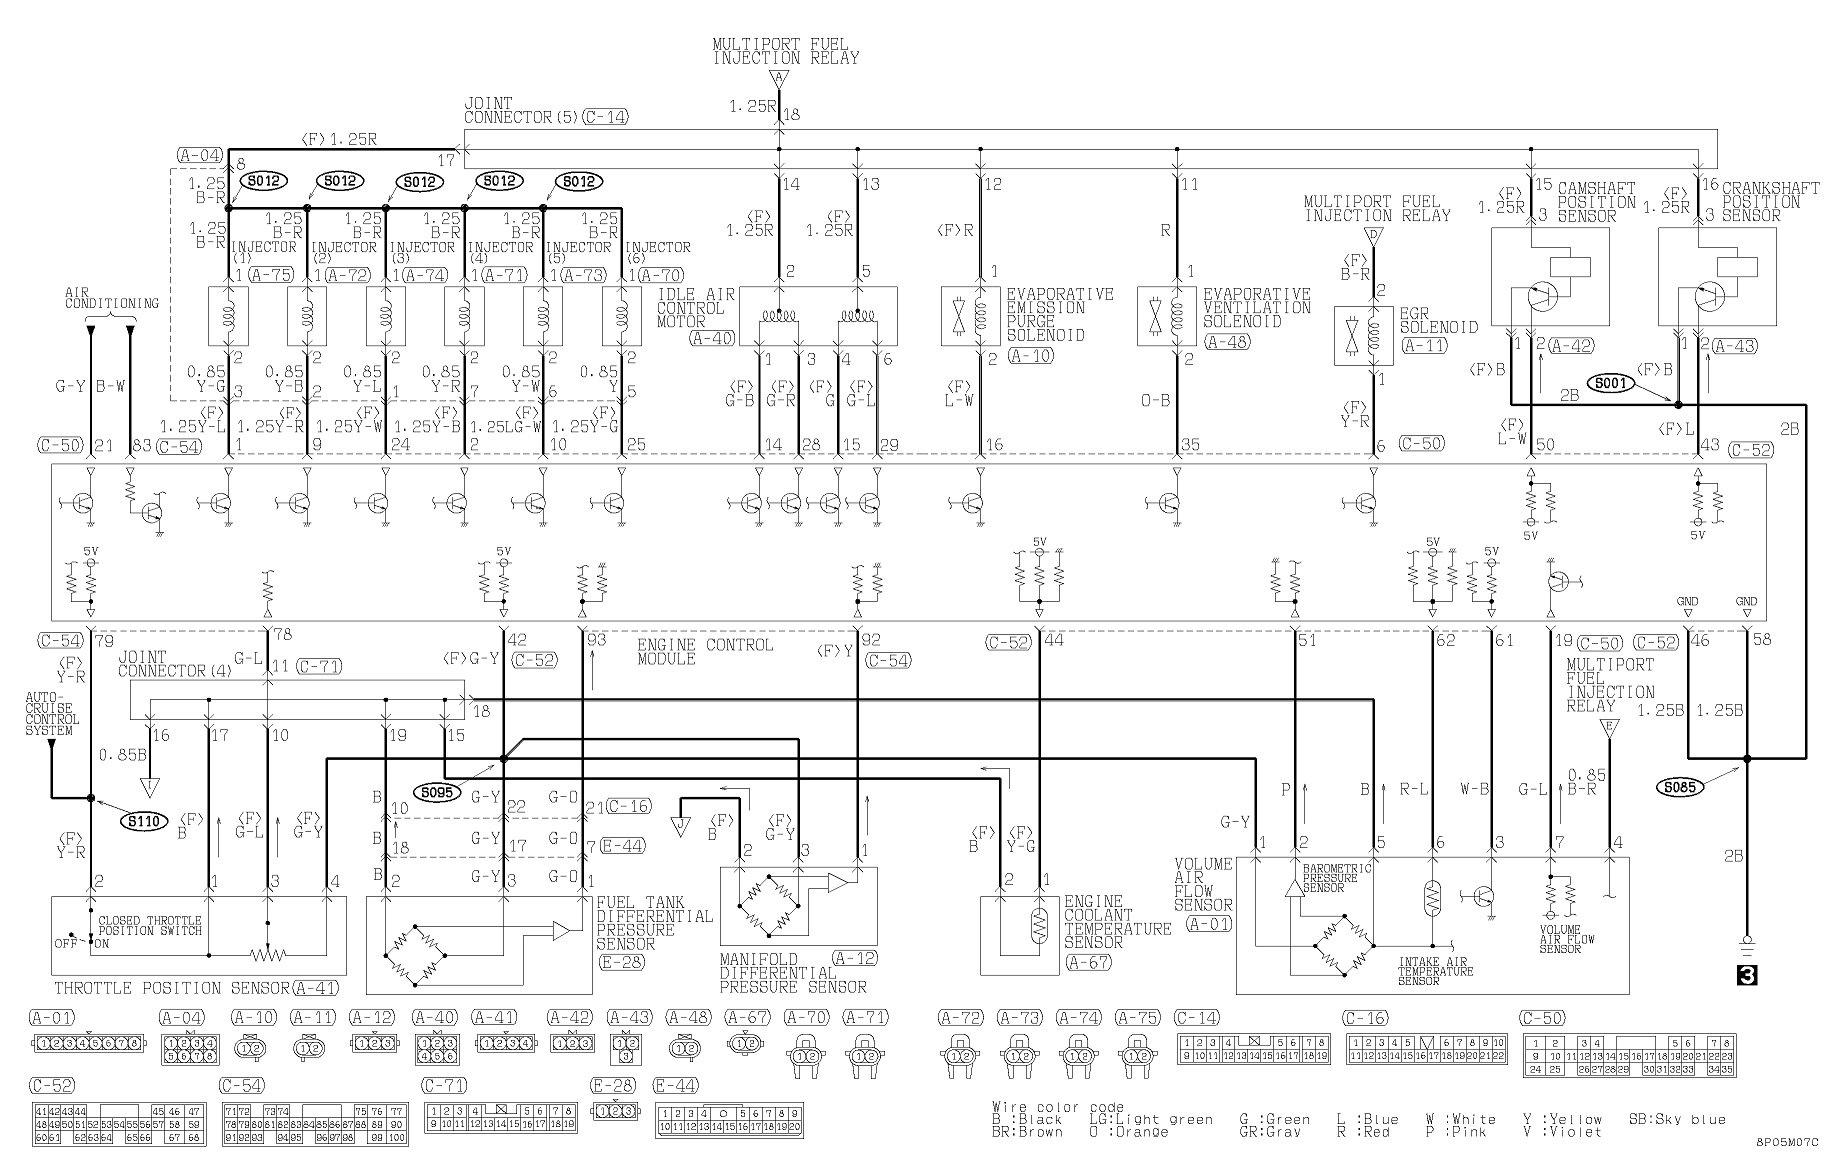 HF_7253] 2000 Mitsubishi Montero Wiring Diagram Download Diagram | 1998 Mitsubishi Montero Stereo Wiring Diagram |  | Hroni Frag Frag Teria Unre Garna Mohammedshrine Librar Wiring 101